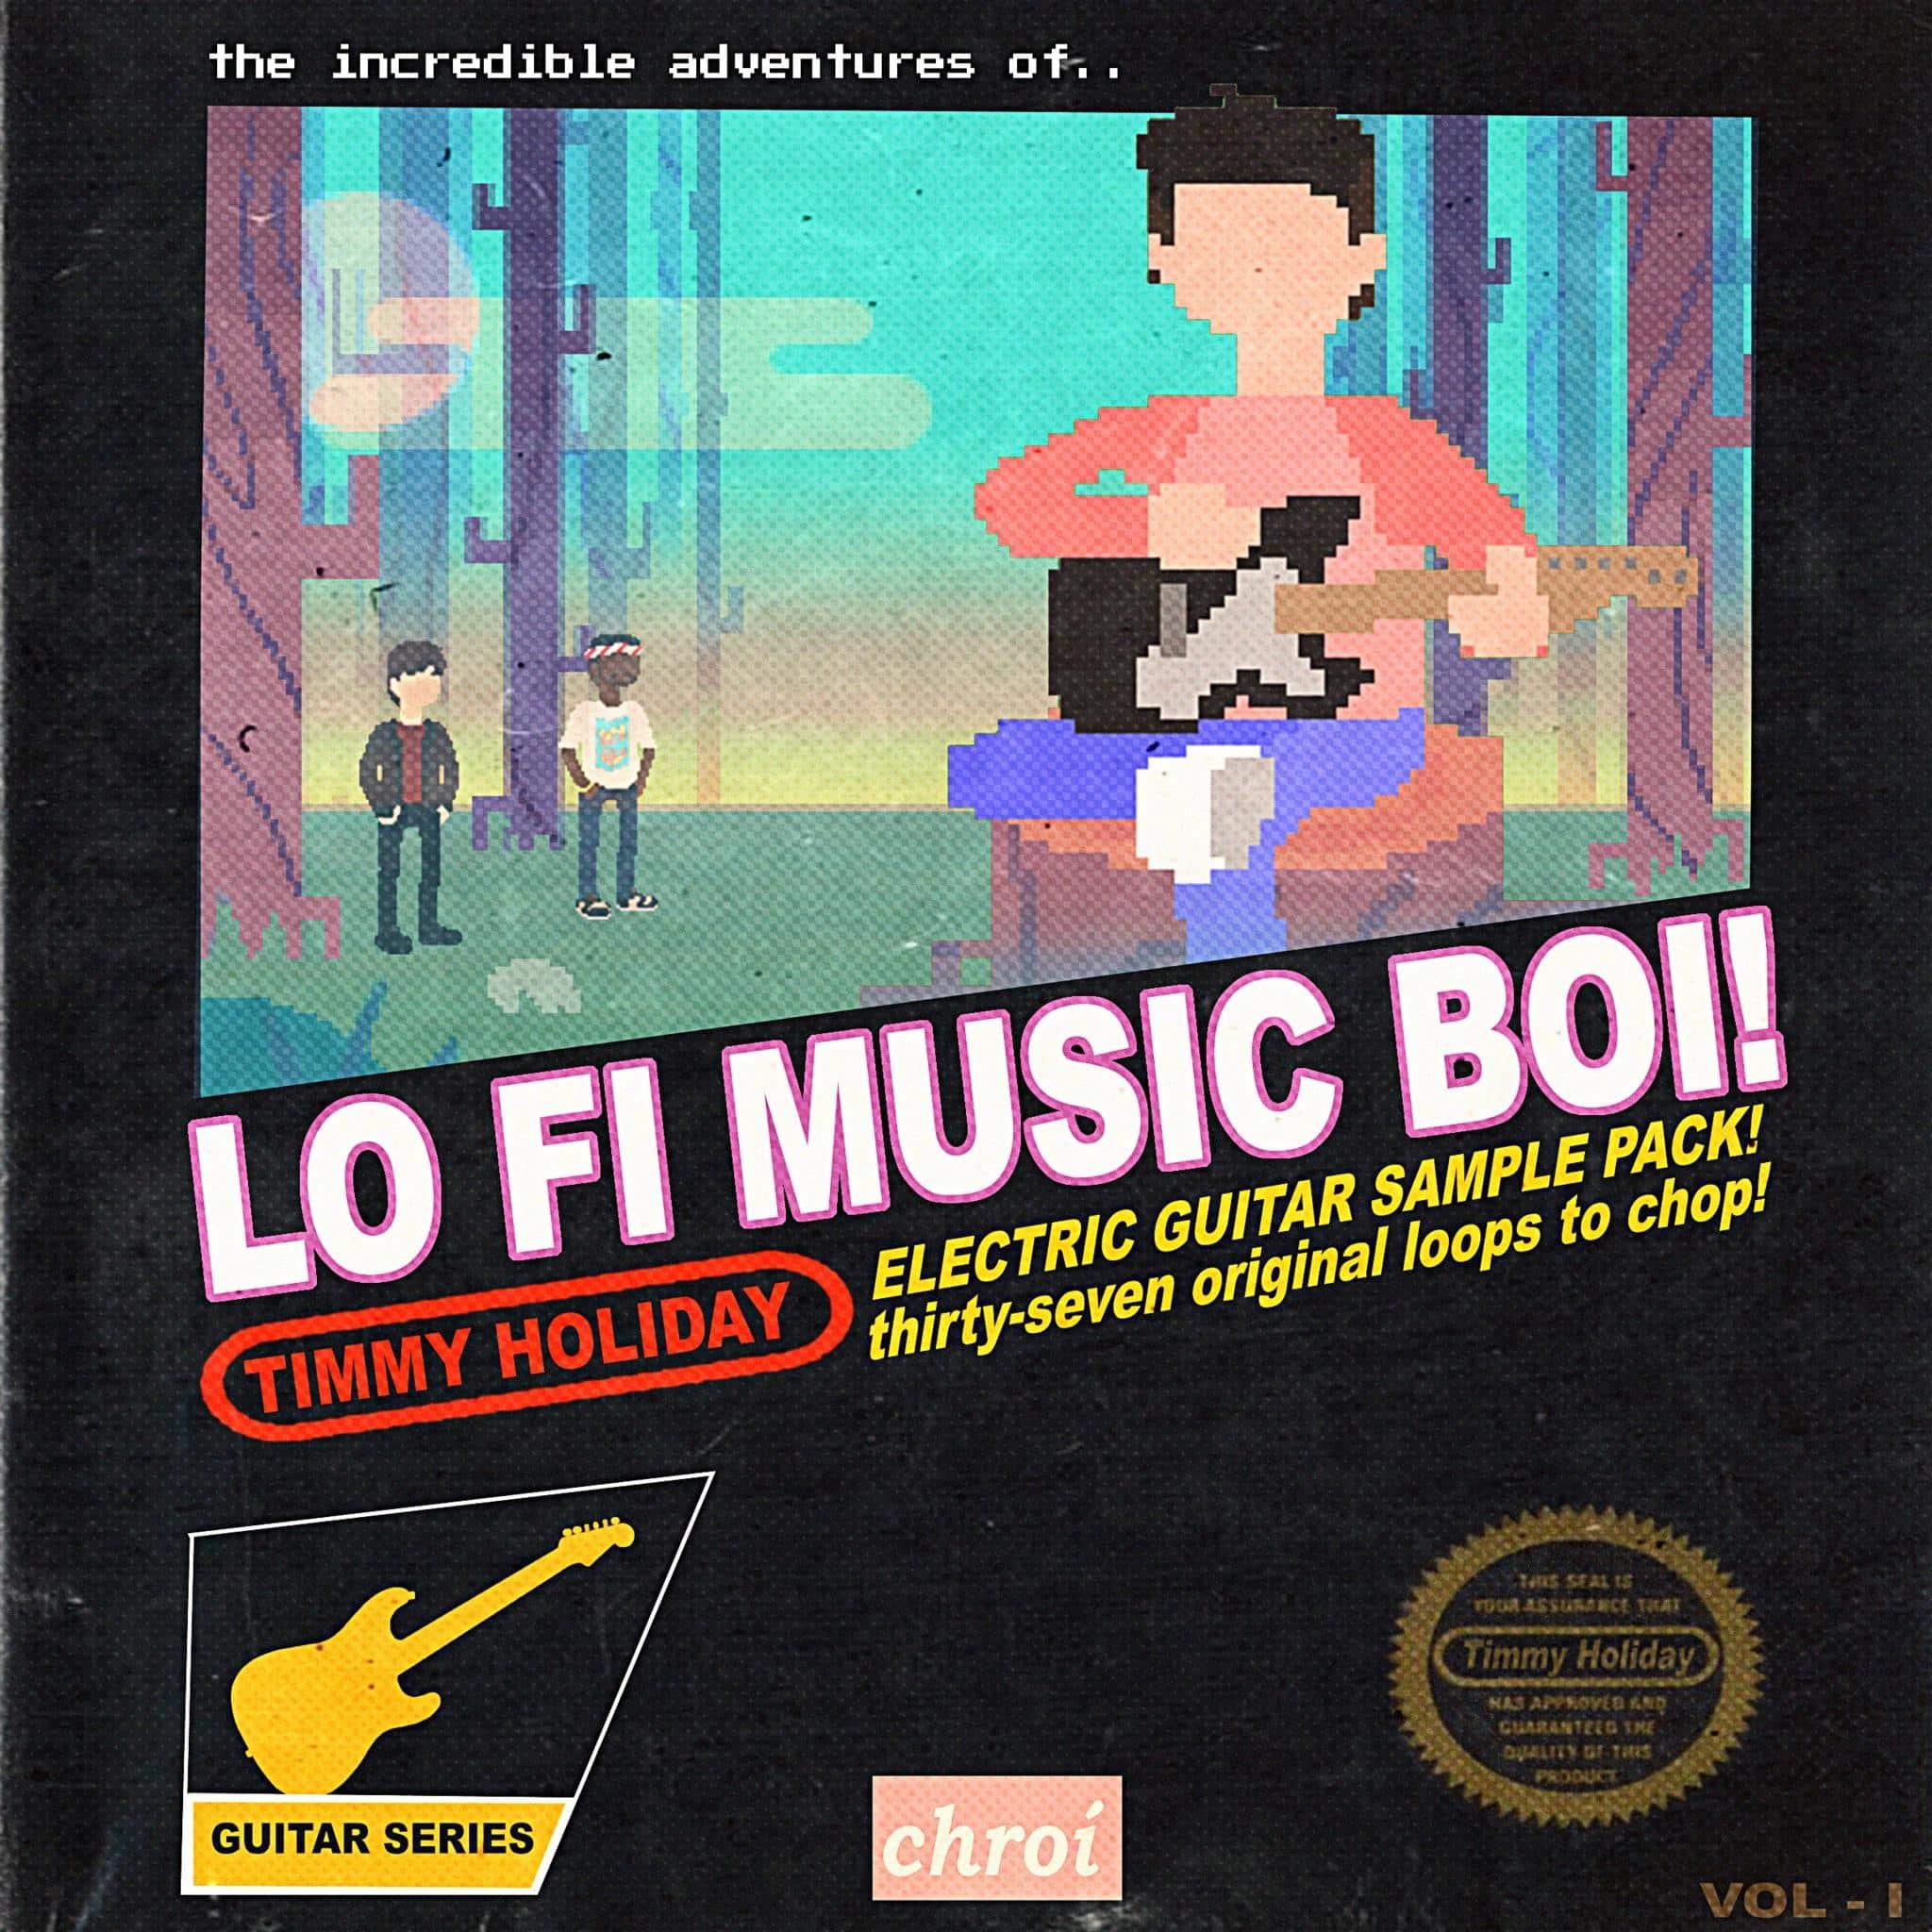 Chroí Music - LO FI MUSIC BOI! - Electric Guitar Sample Pack